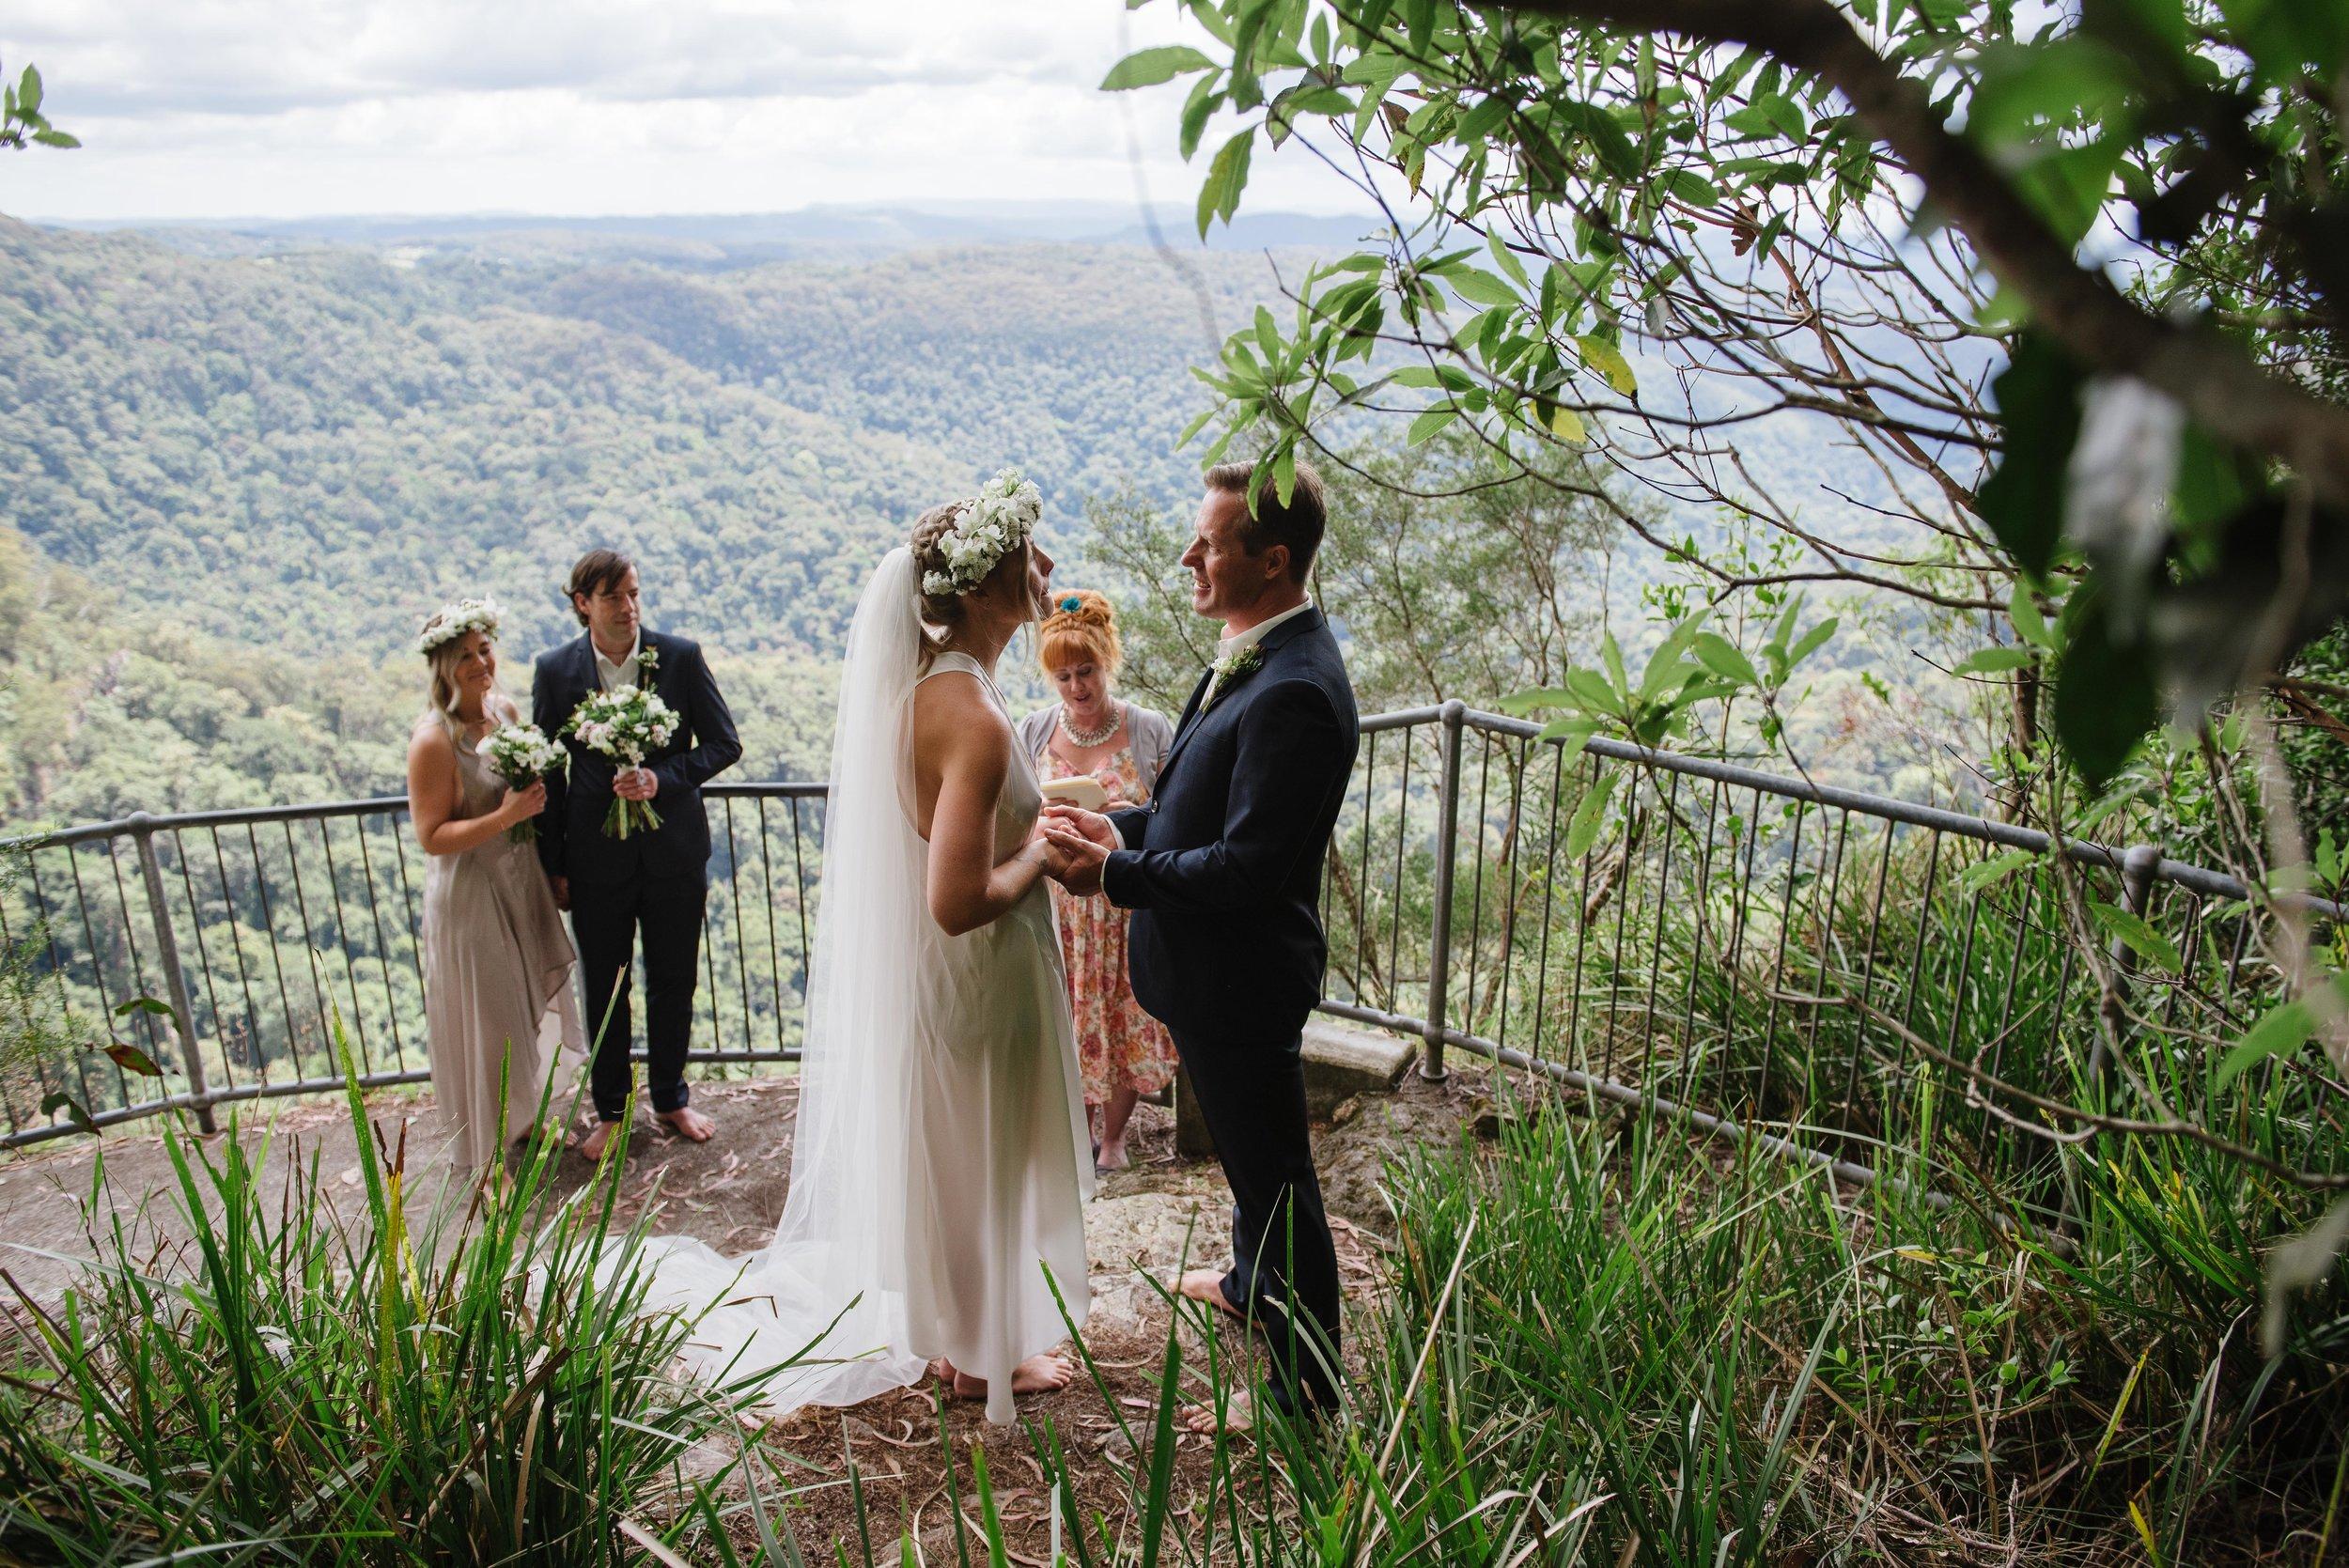 Carla and Luke- wedding photographer, byron bay wedding and family photographer, tweed heads wedding and family photography-187.jpg